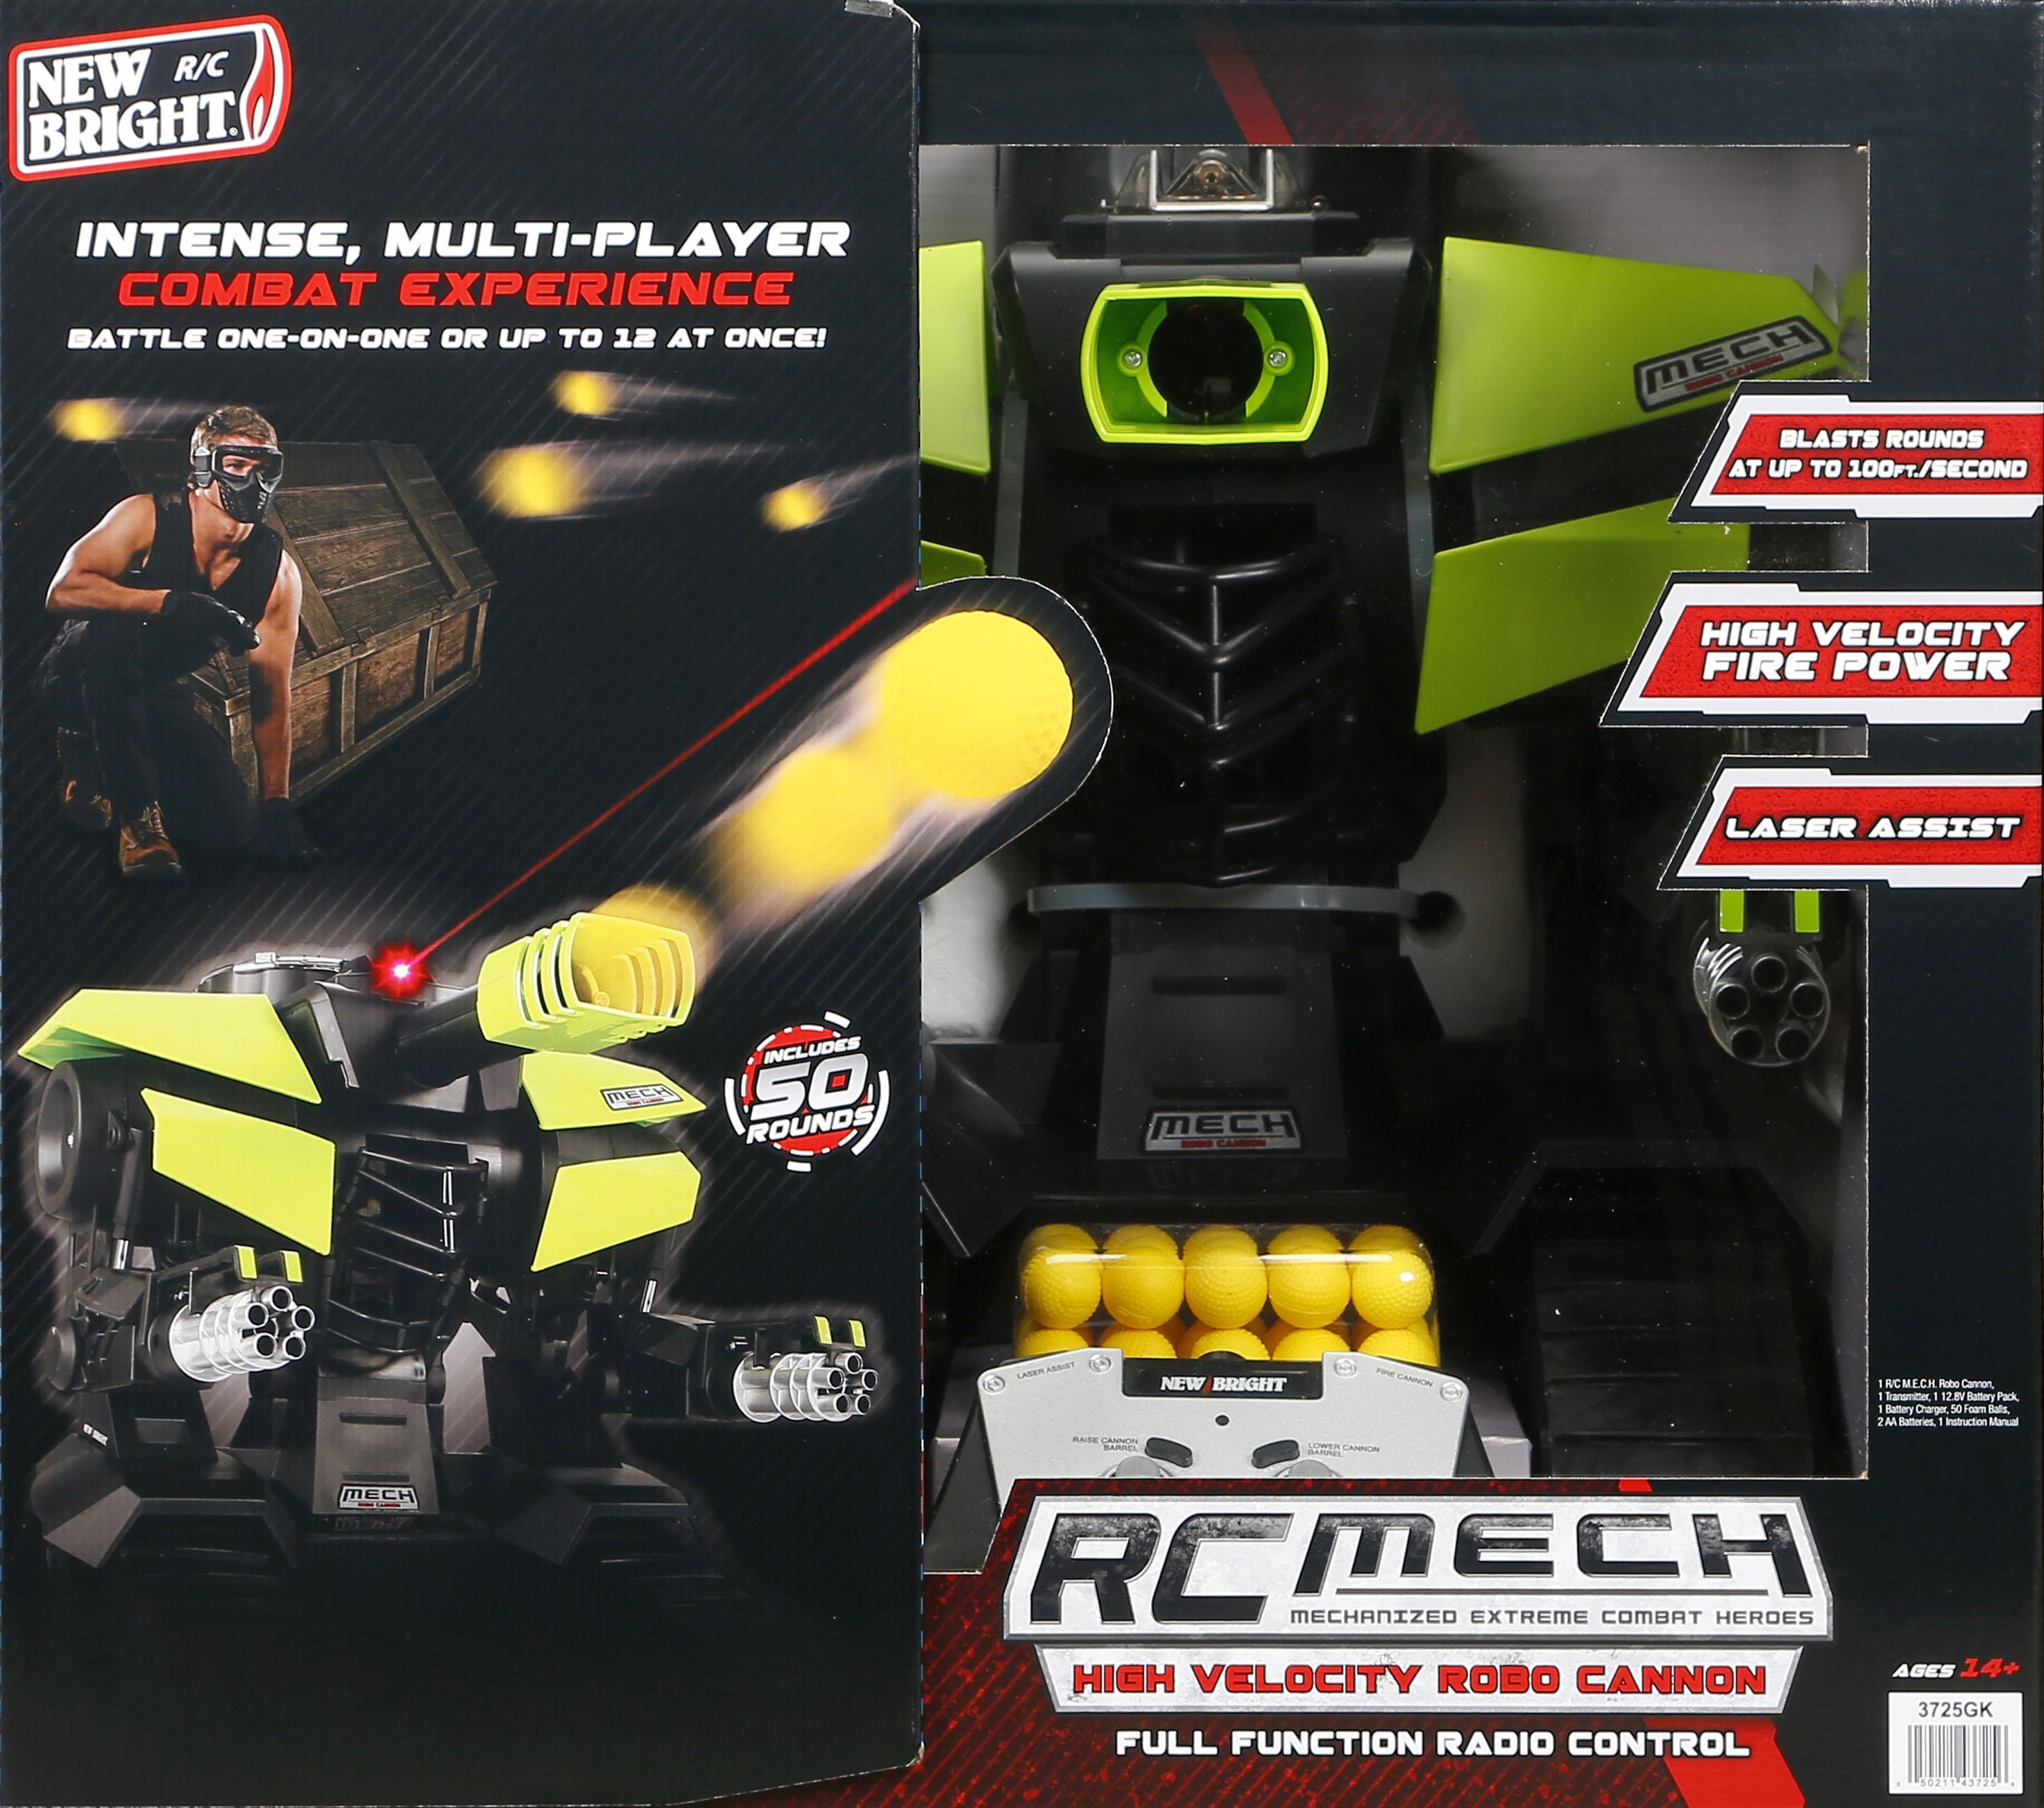 Bright Mech Robo Cannon – Michaeltaborsky